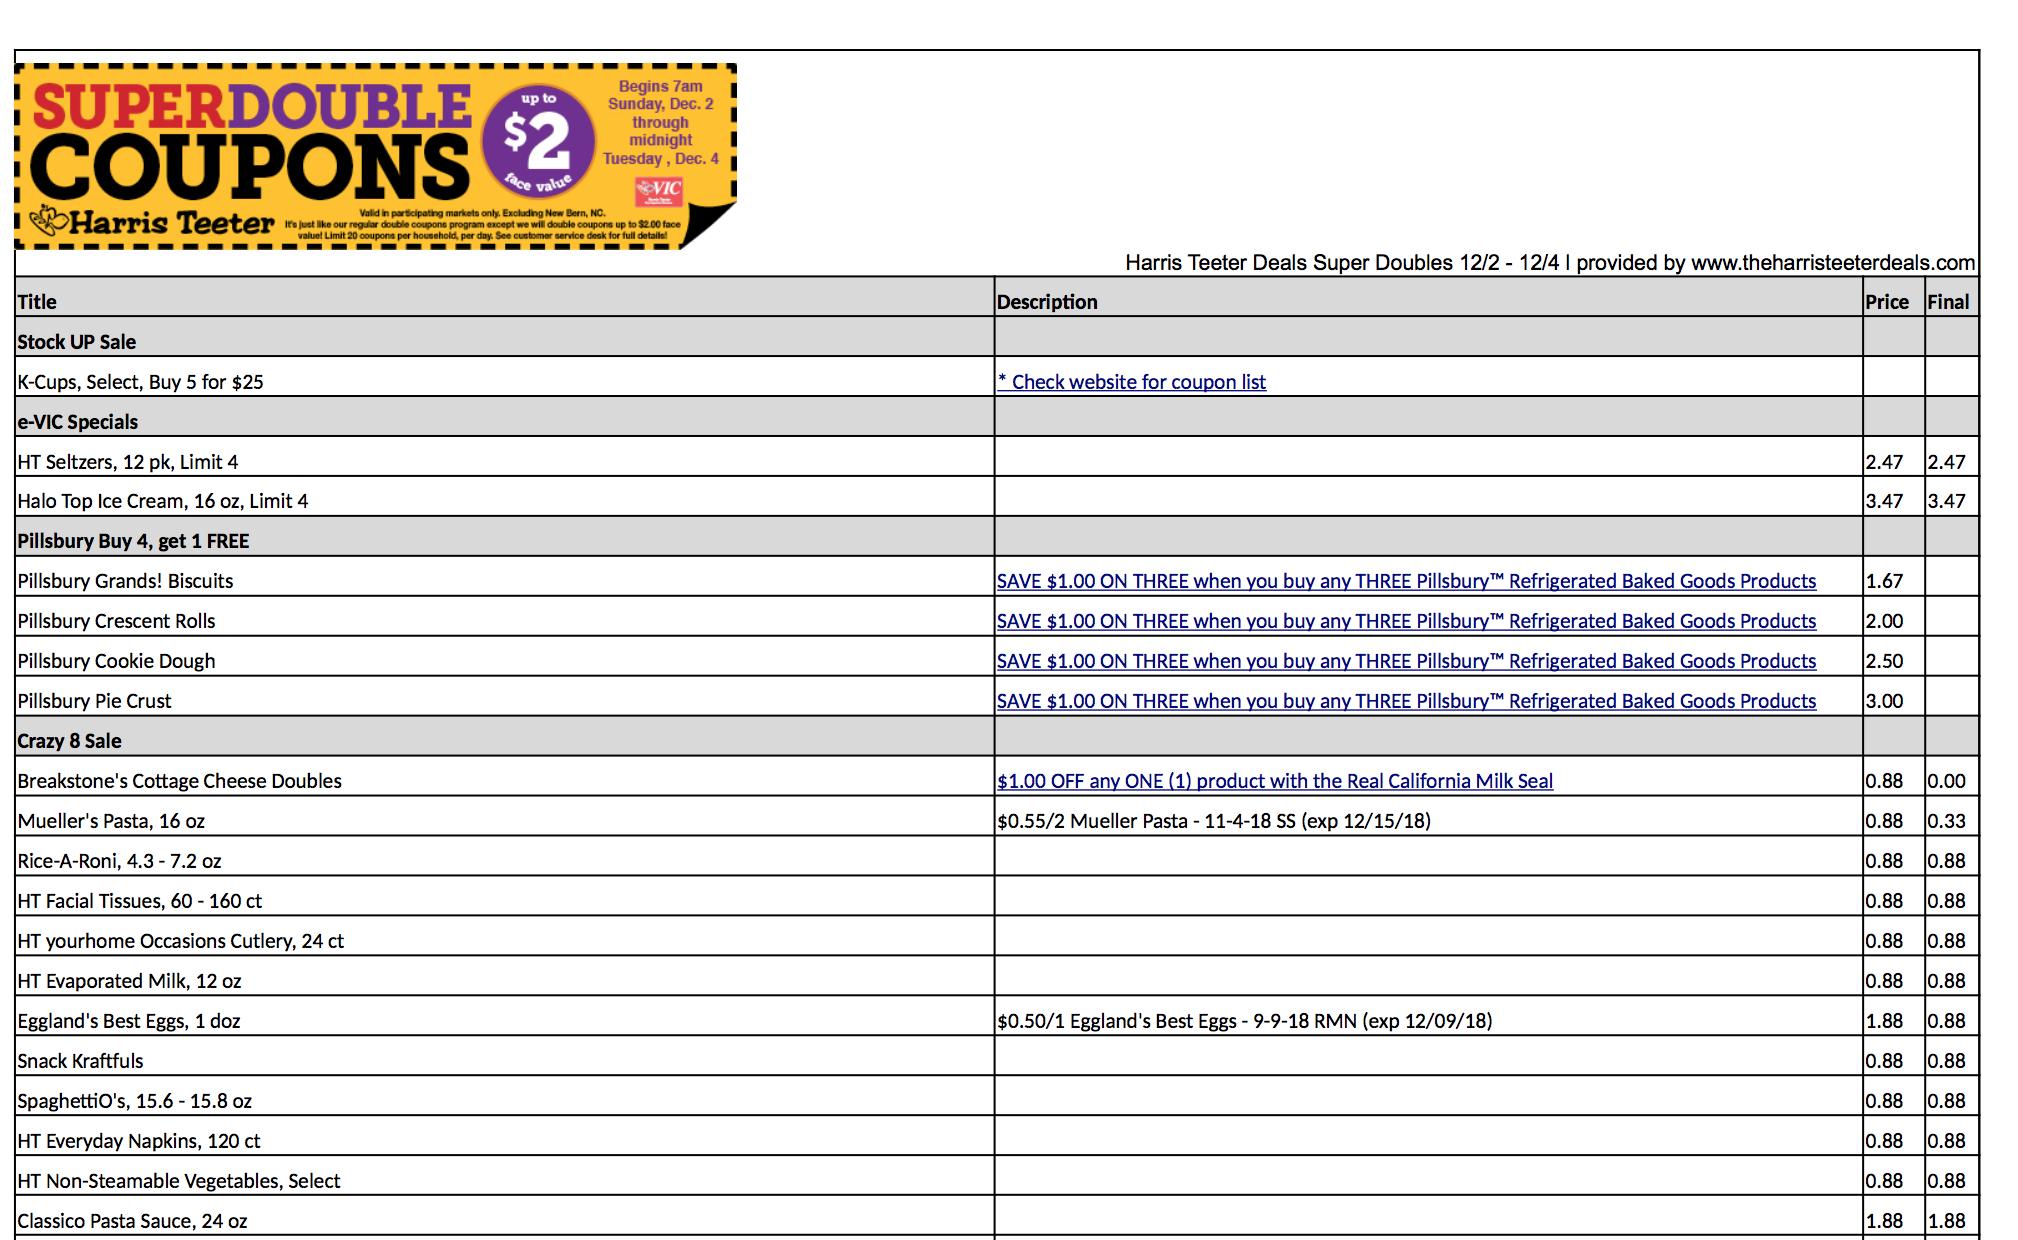 Harris Teeter Coupon Spreadsheet Inside Super Doubles Spreadsheet  The Harris Teeter Deals